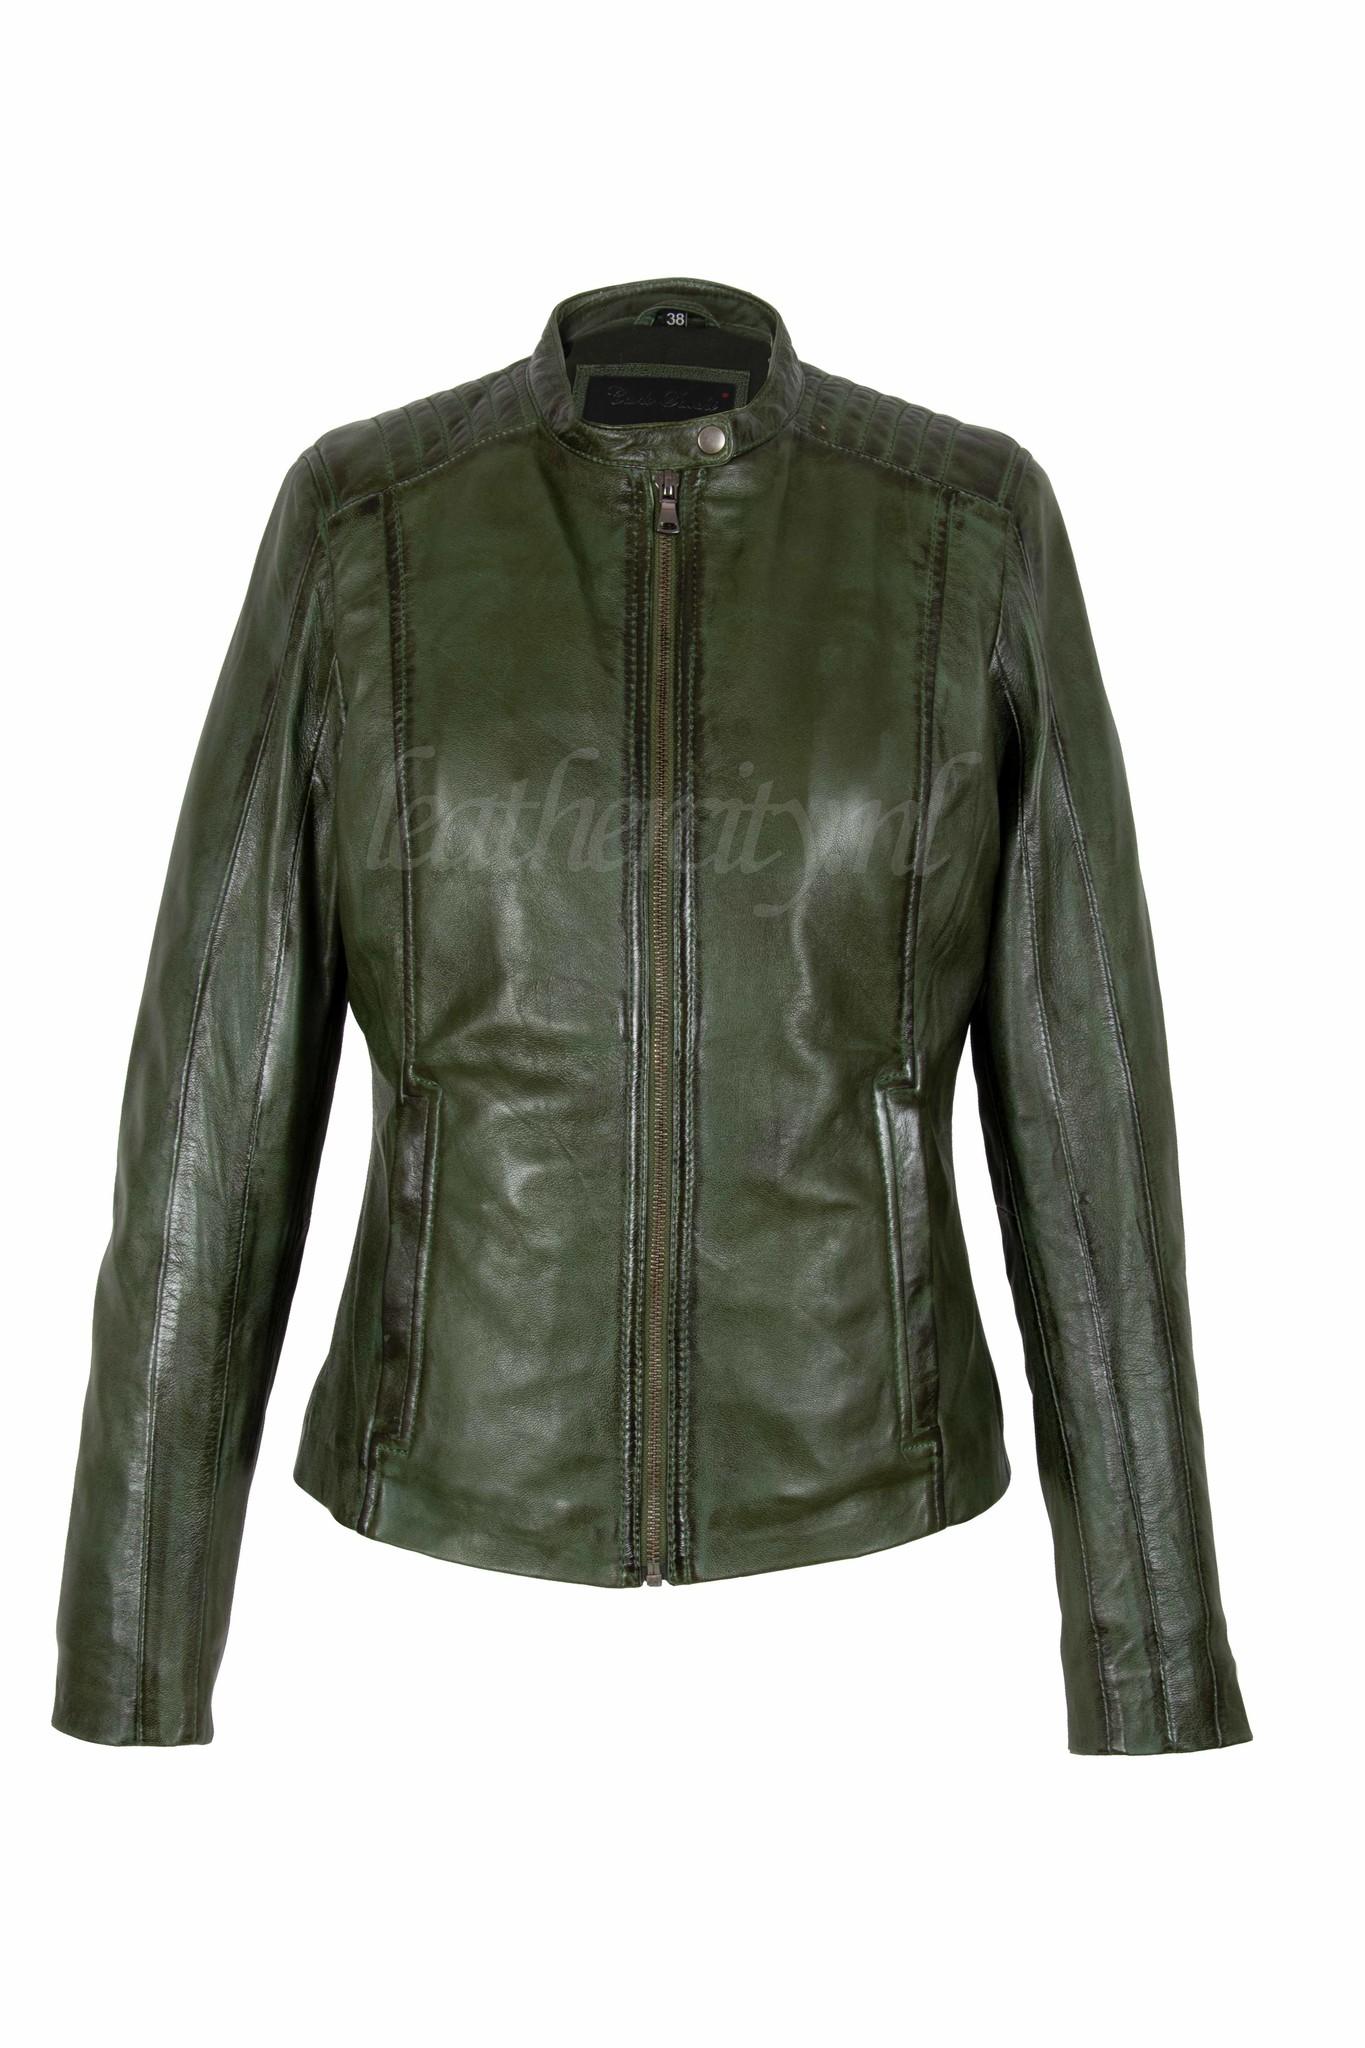 Leren Jas Dames Groen.Dames Leren Jas Groen Silve Leather City